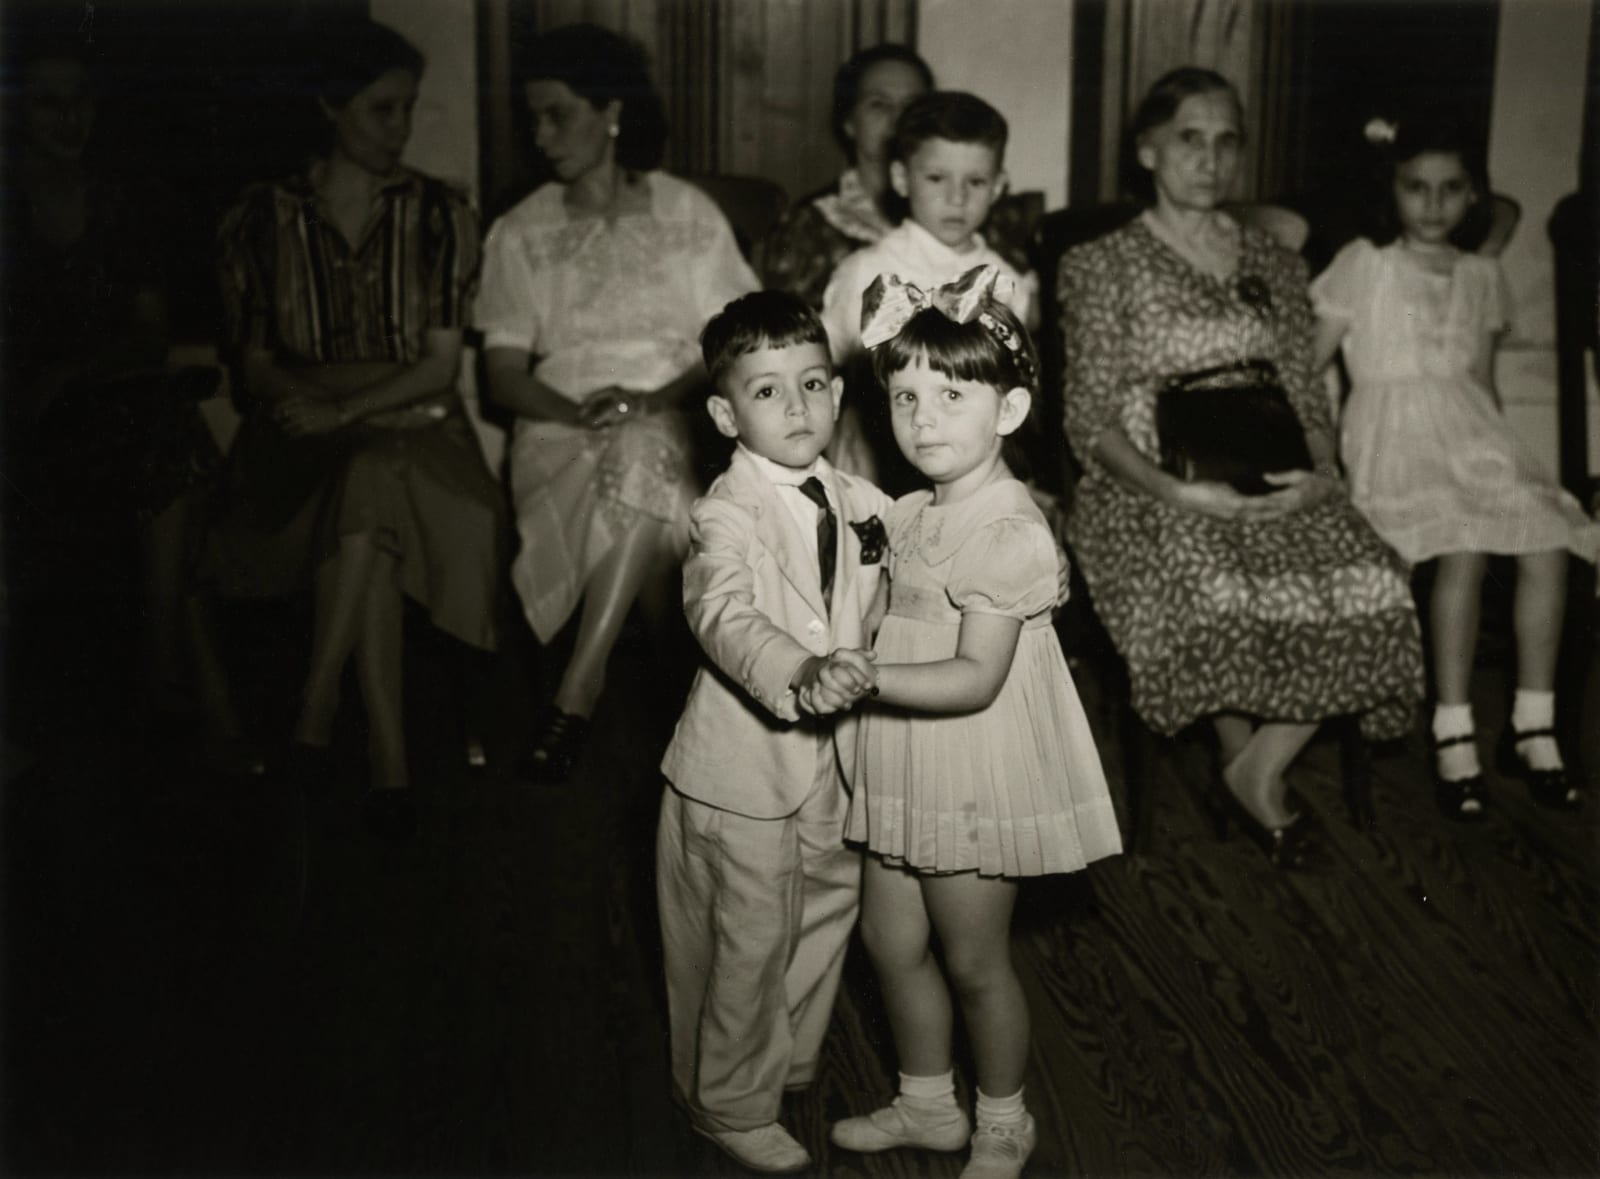 Jack Delano - untitled (two kids dancing), 1942